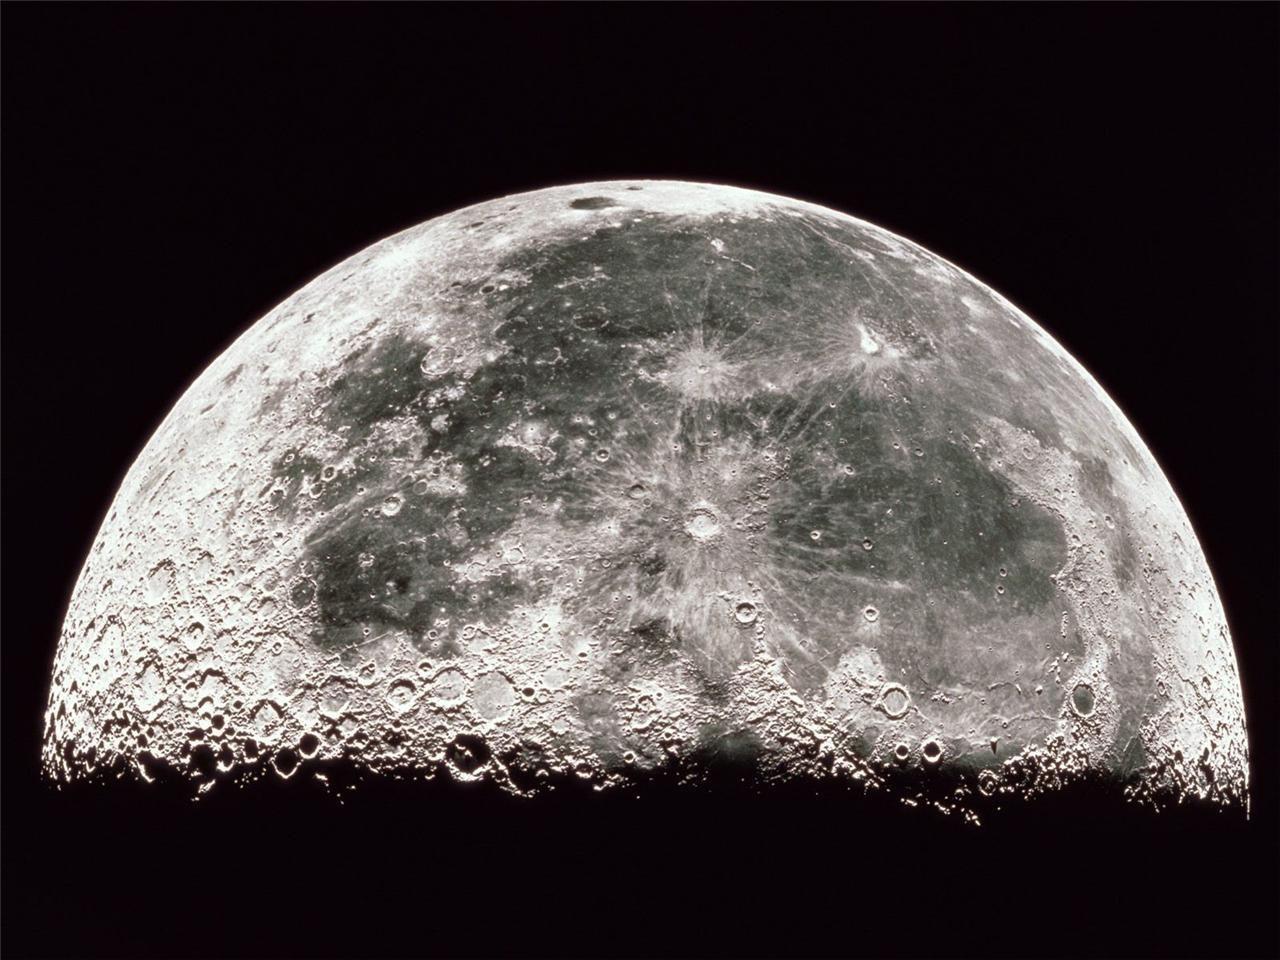 Space Sweatshirt Crescent Half Moon Astronomy Galaxy Lunar Stars Photography